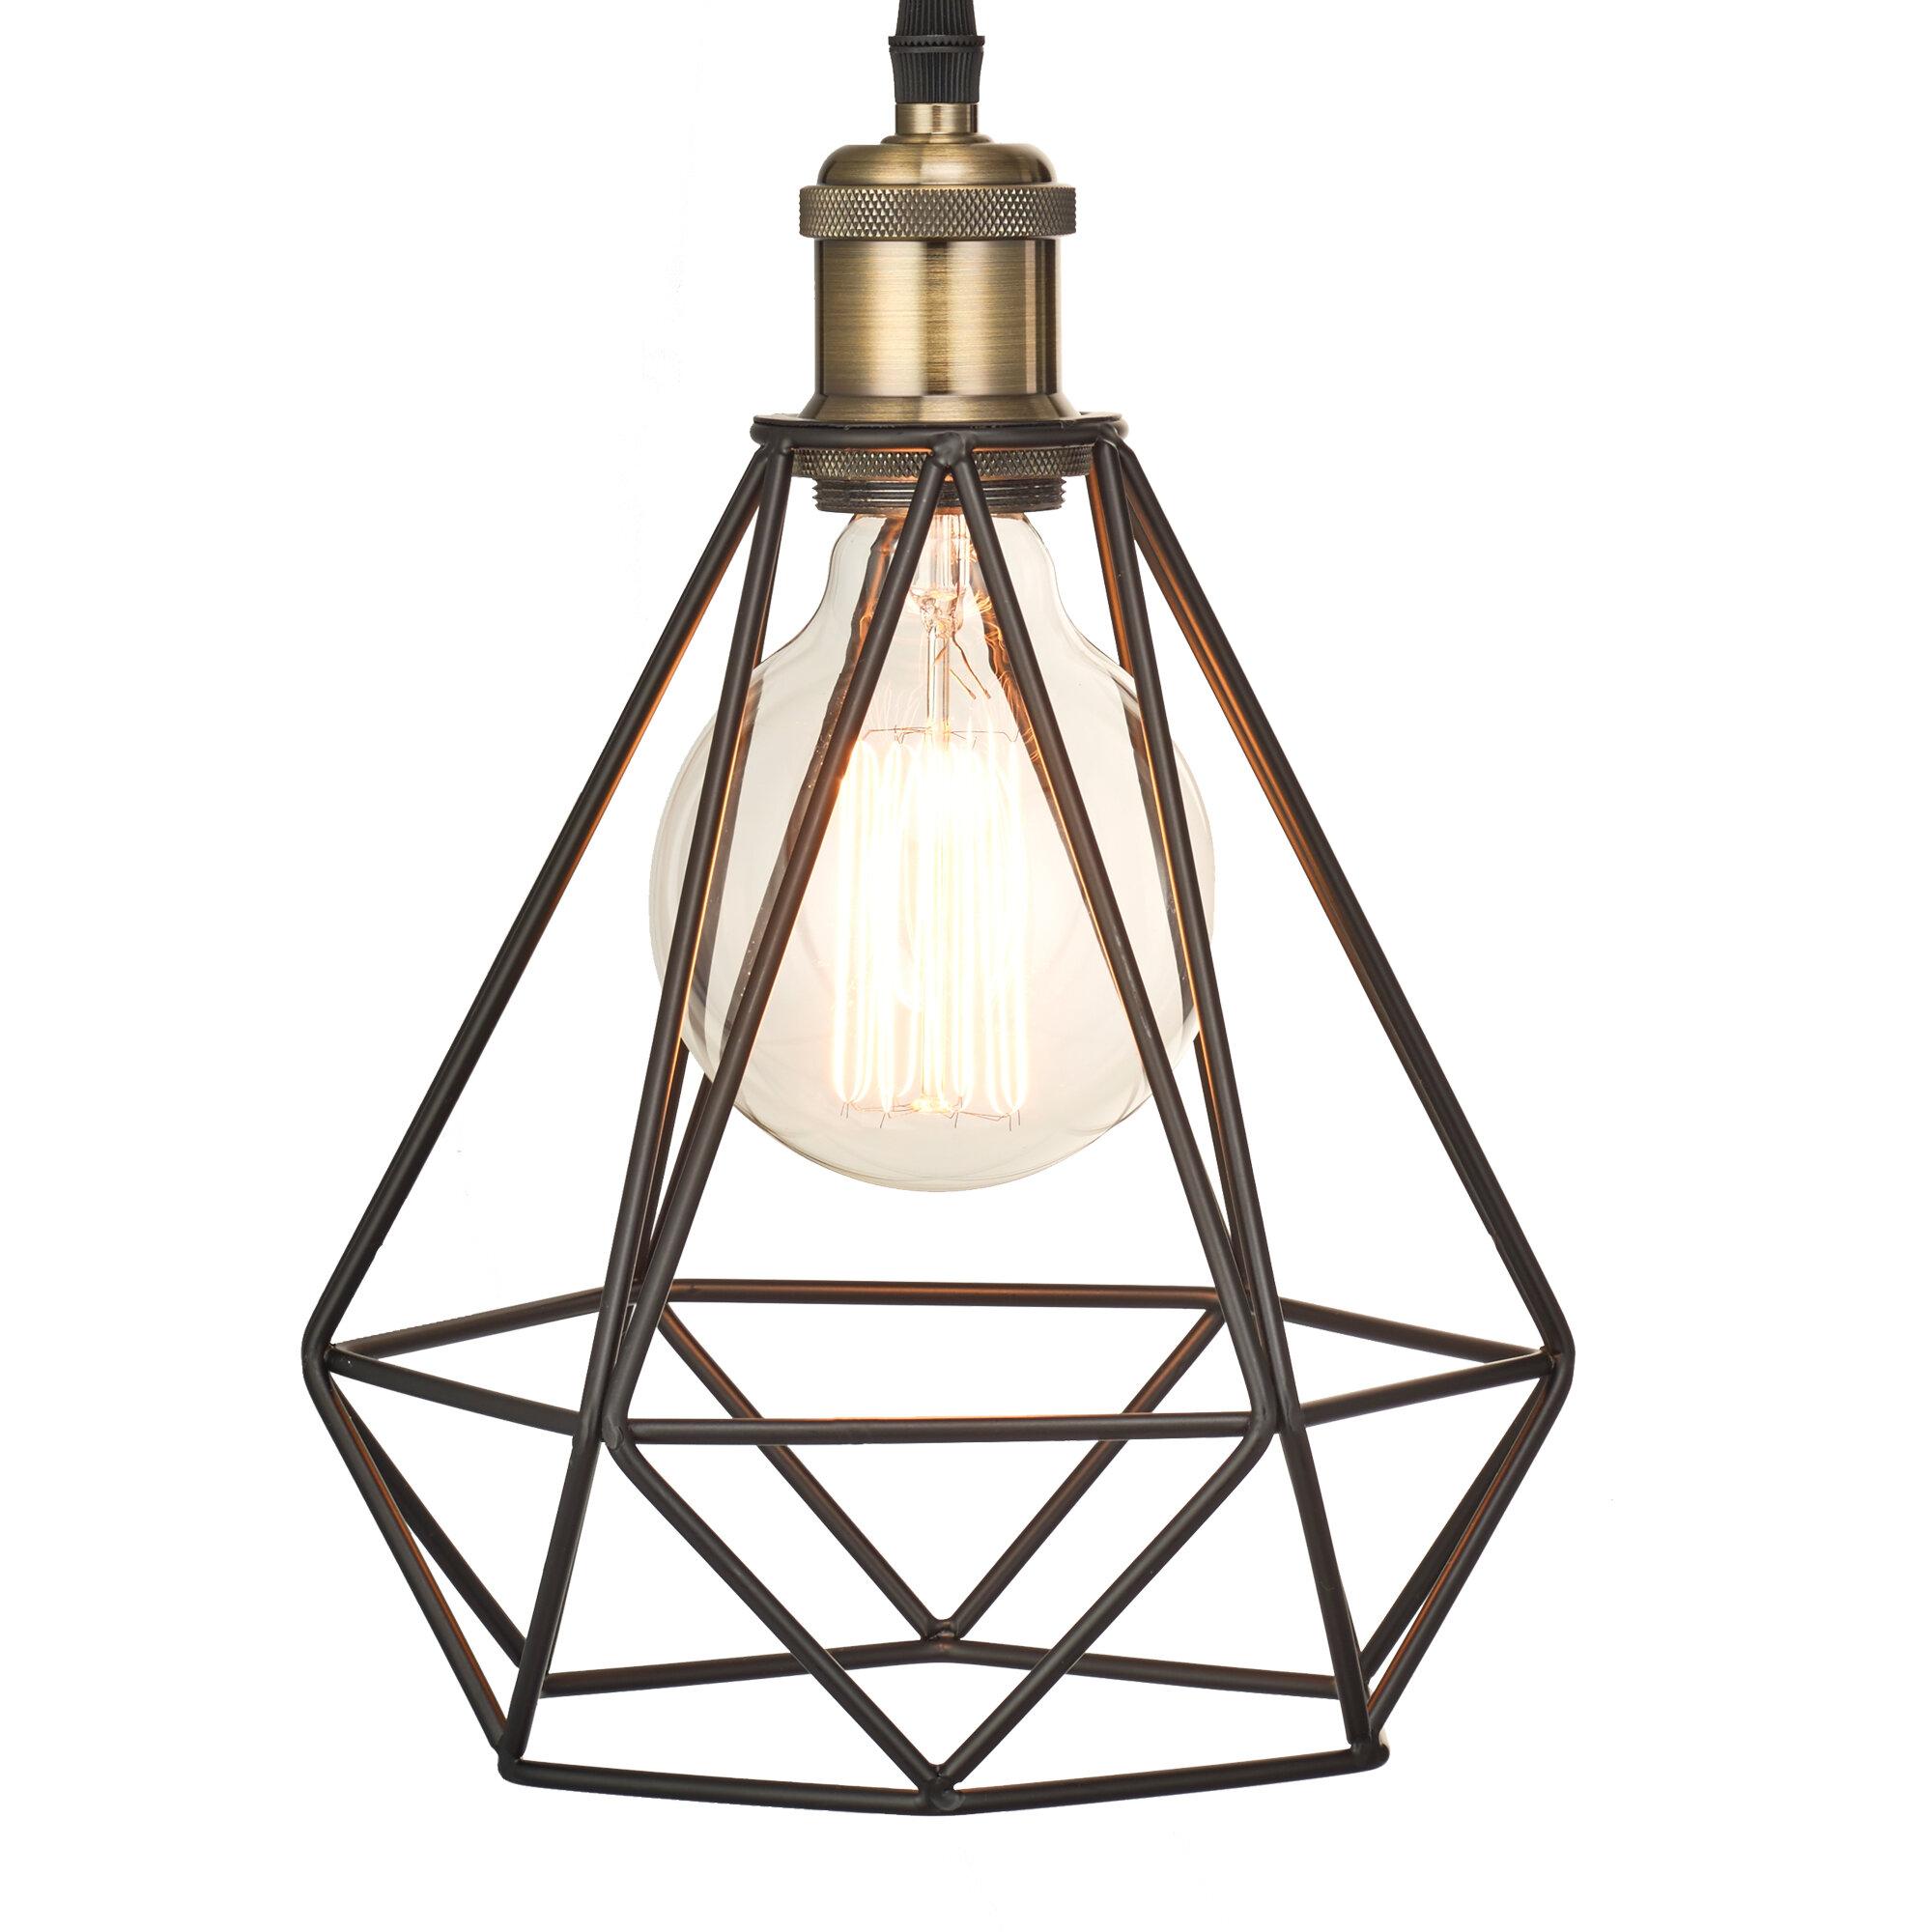 Danial Diamond Cage 1 Light Geometric Pendant